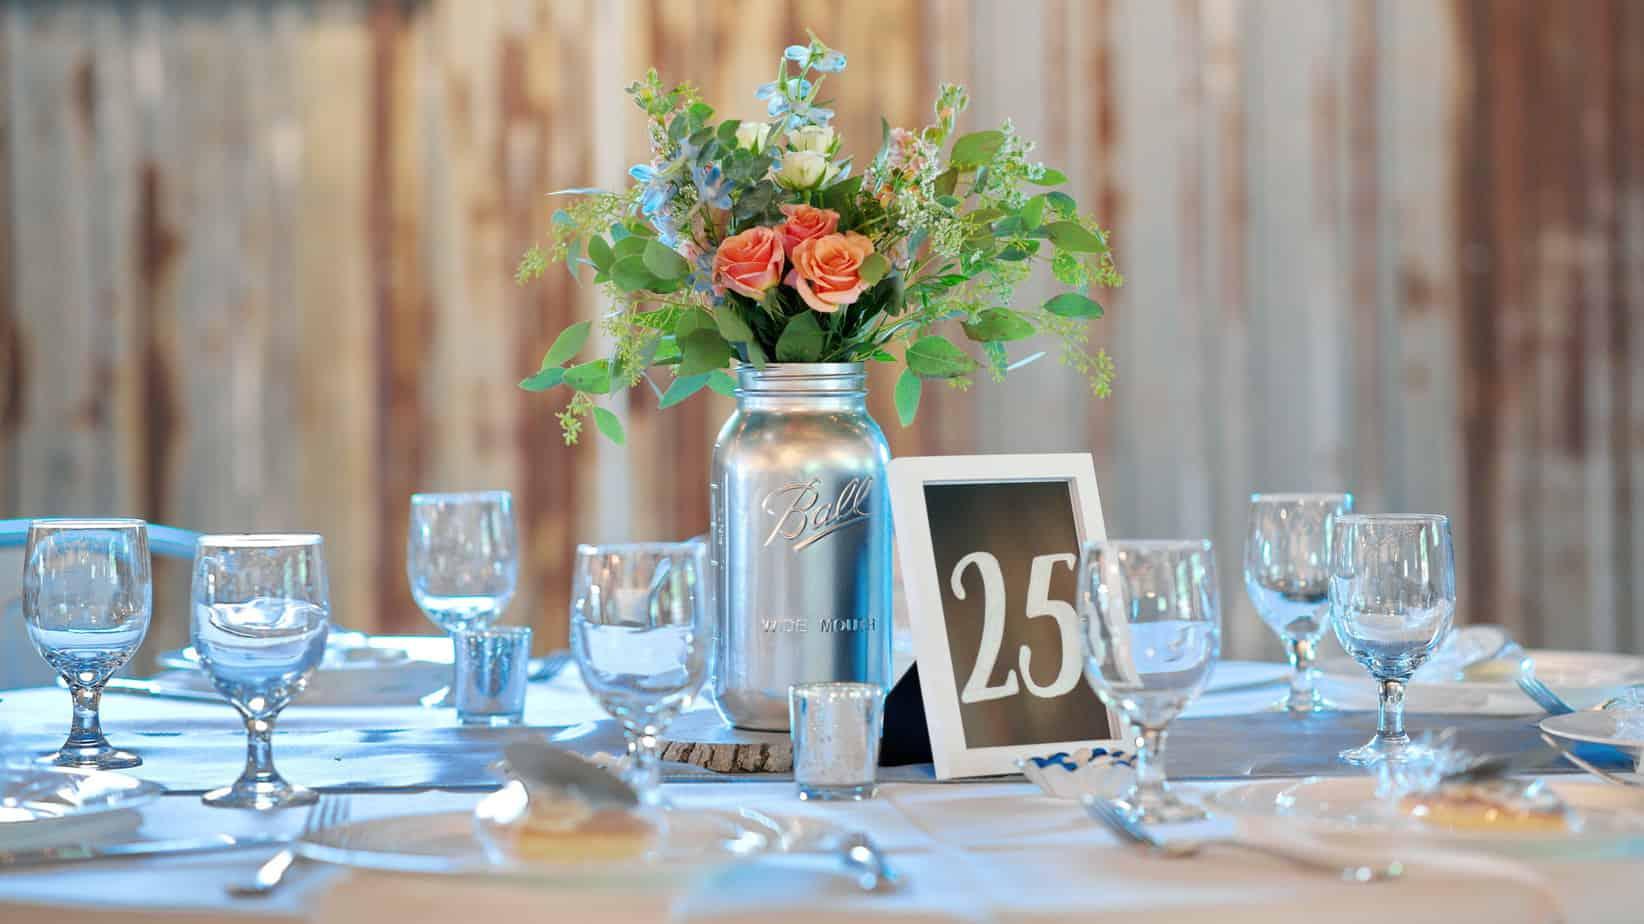 Wedding Table Flower Centerpiece